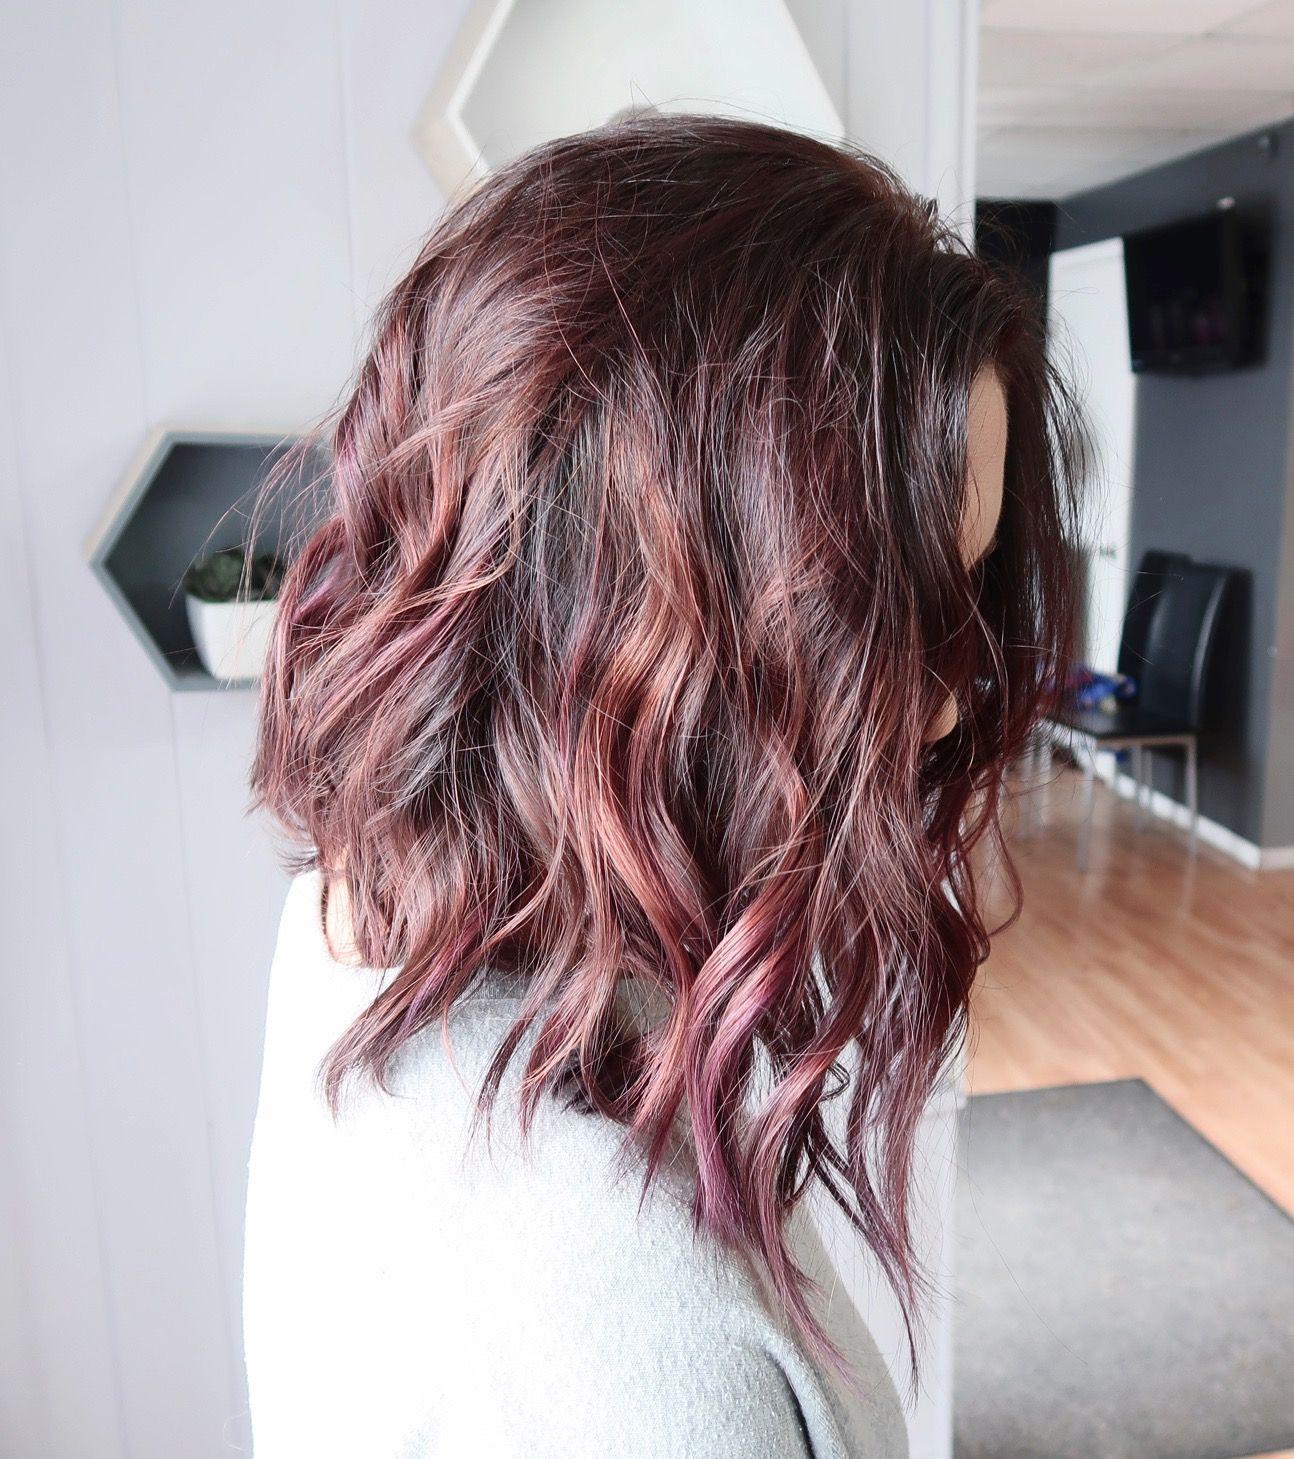 Dusty Plum Brunette Hair Color Subtle Rose And Mauve Balayage On A Textured Aline Lob Haircut